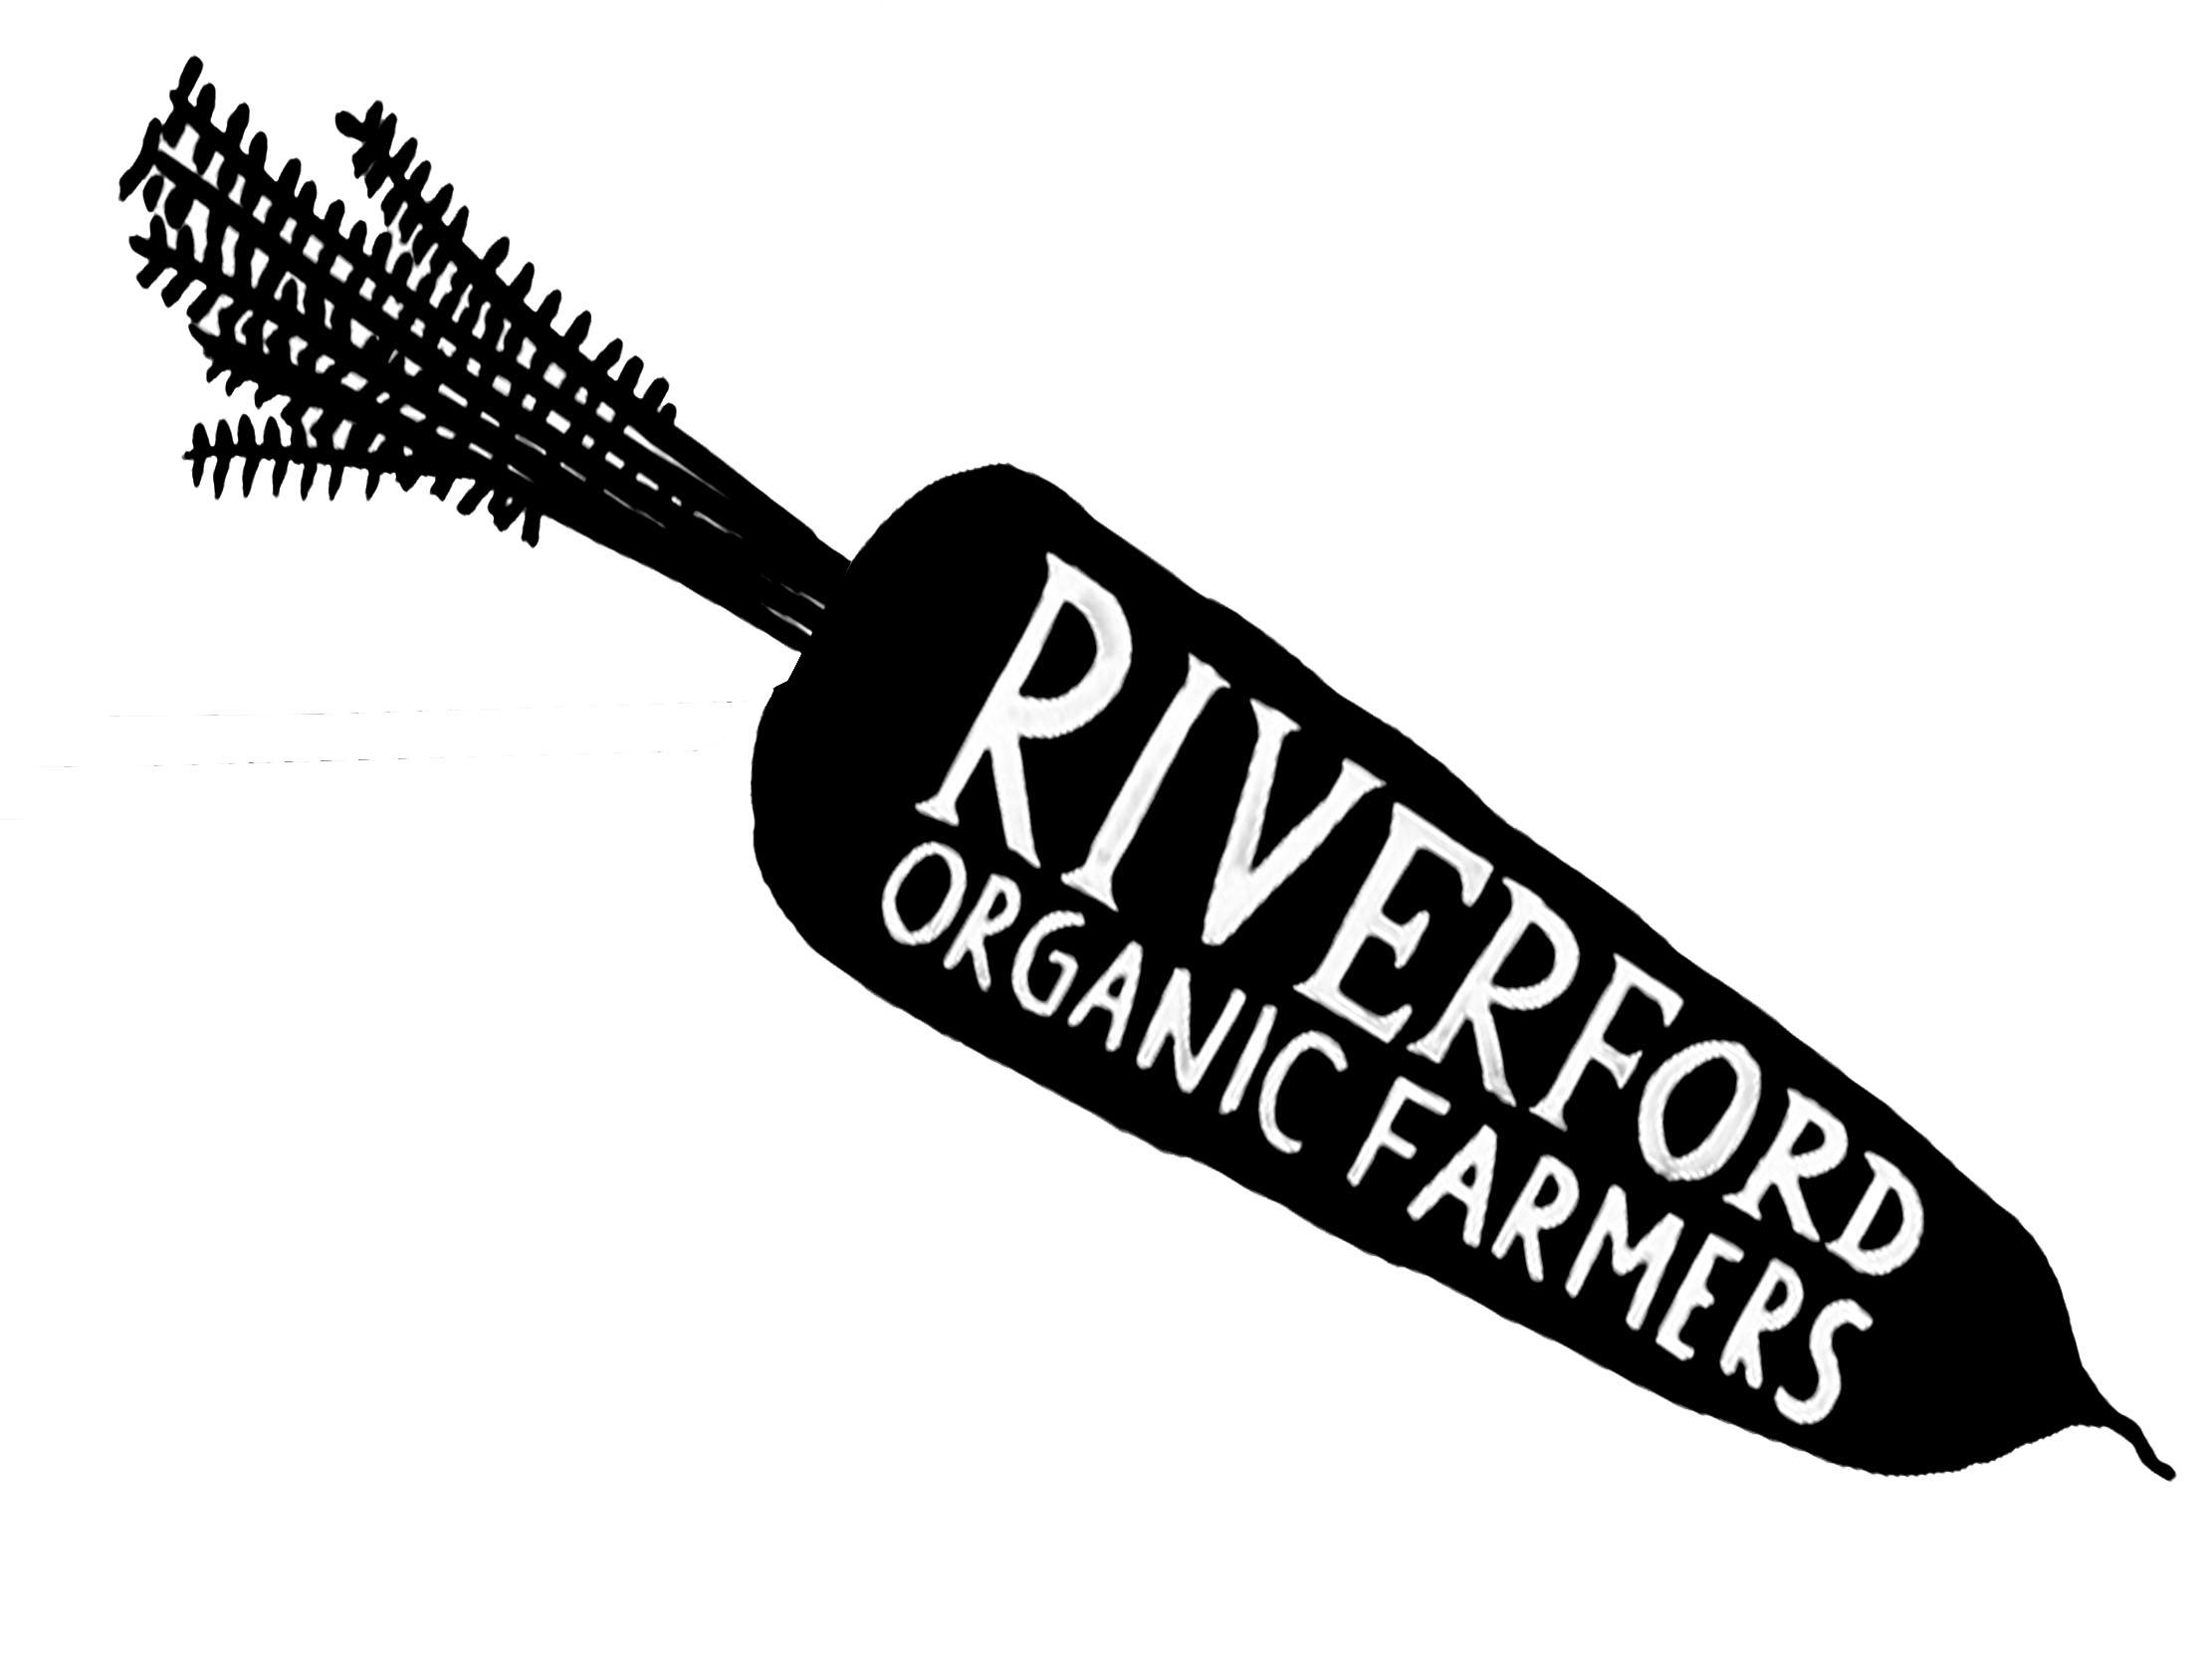 Riverford Organic Reigate